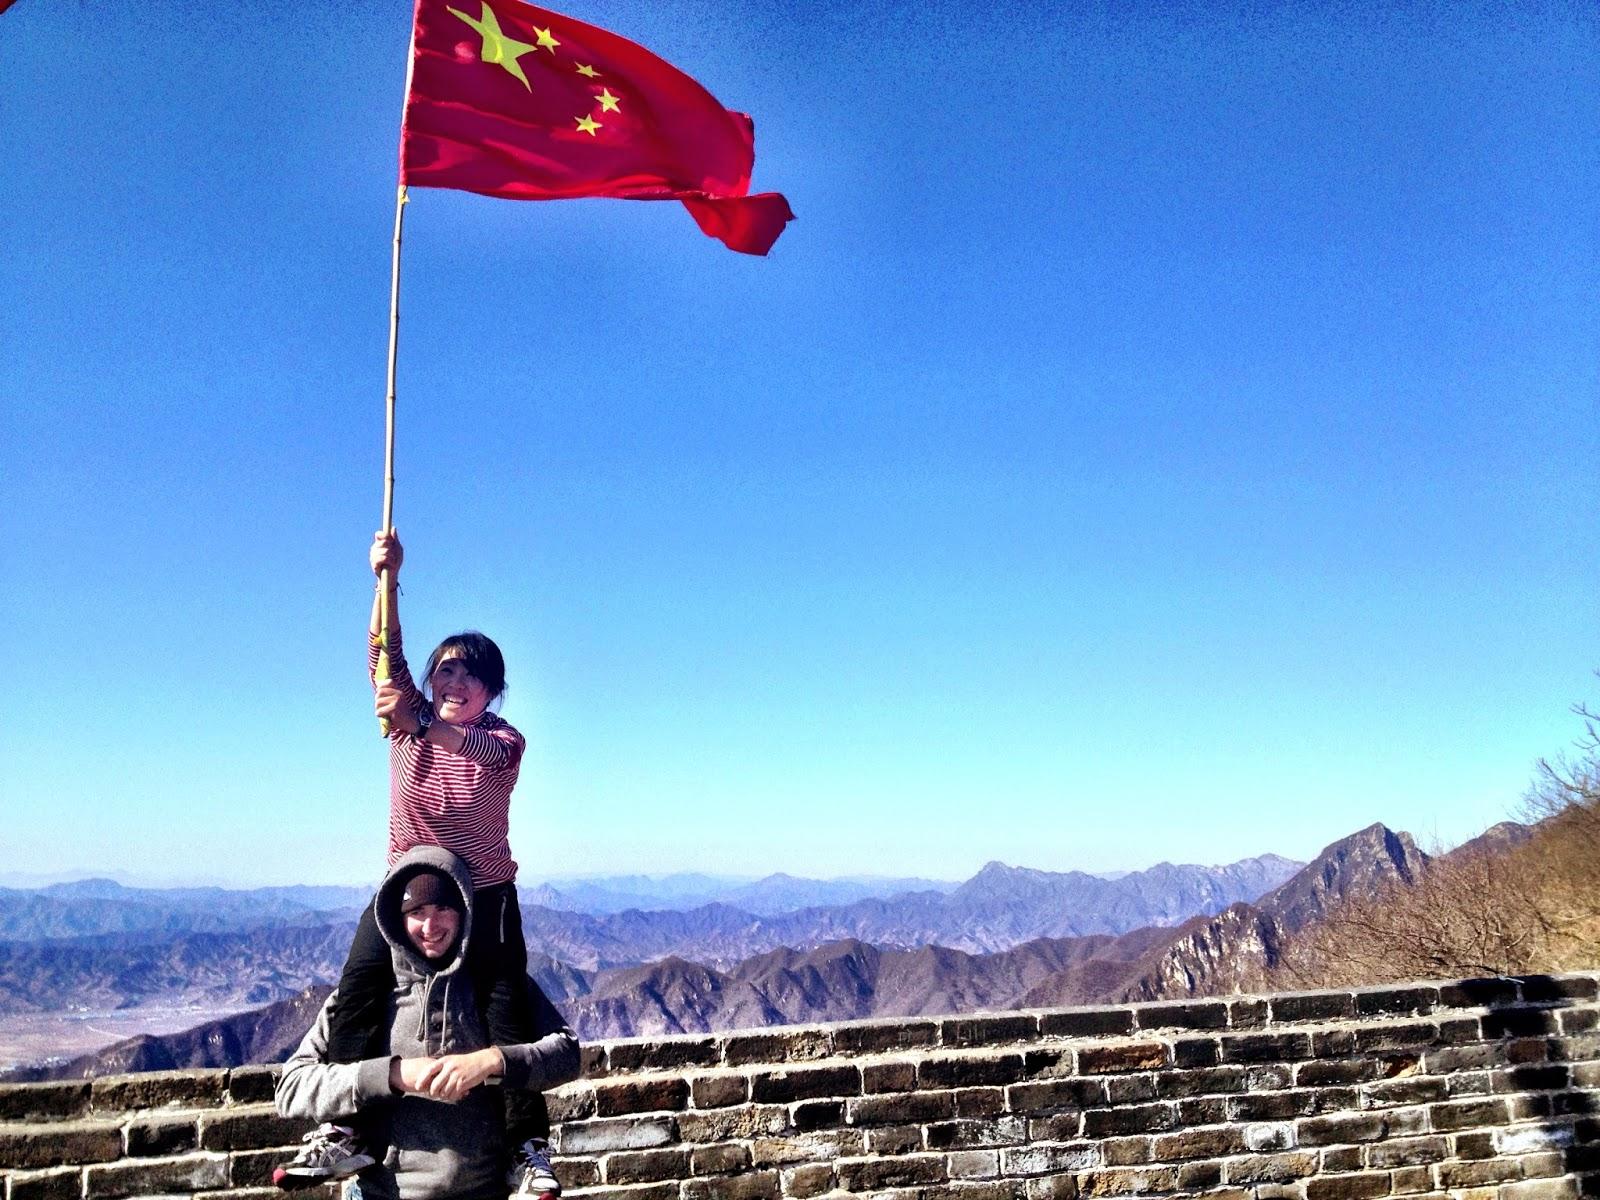 Jenny and Jimmy holding the Chinese flag aloft